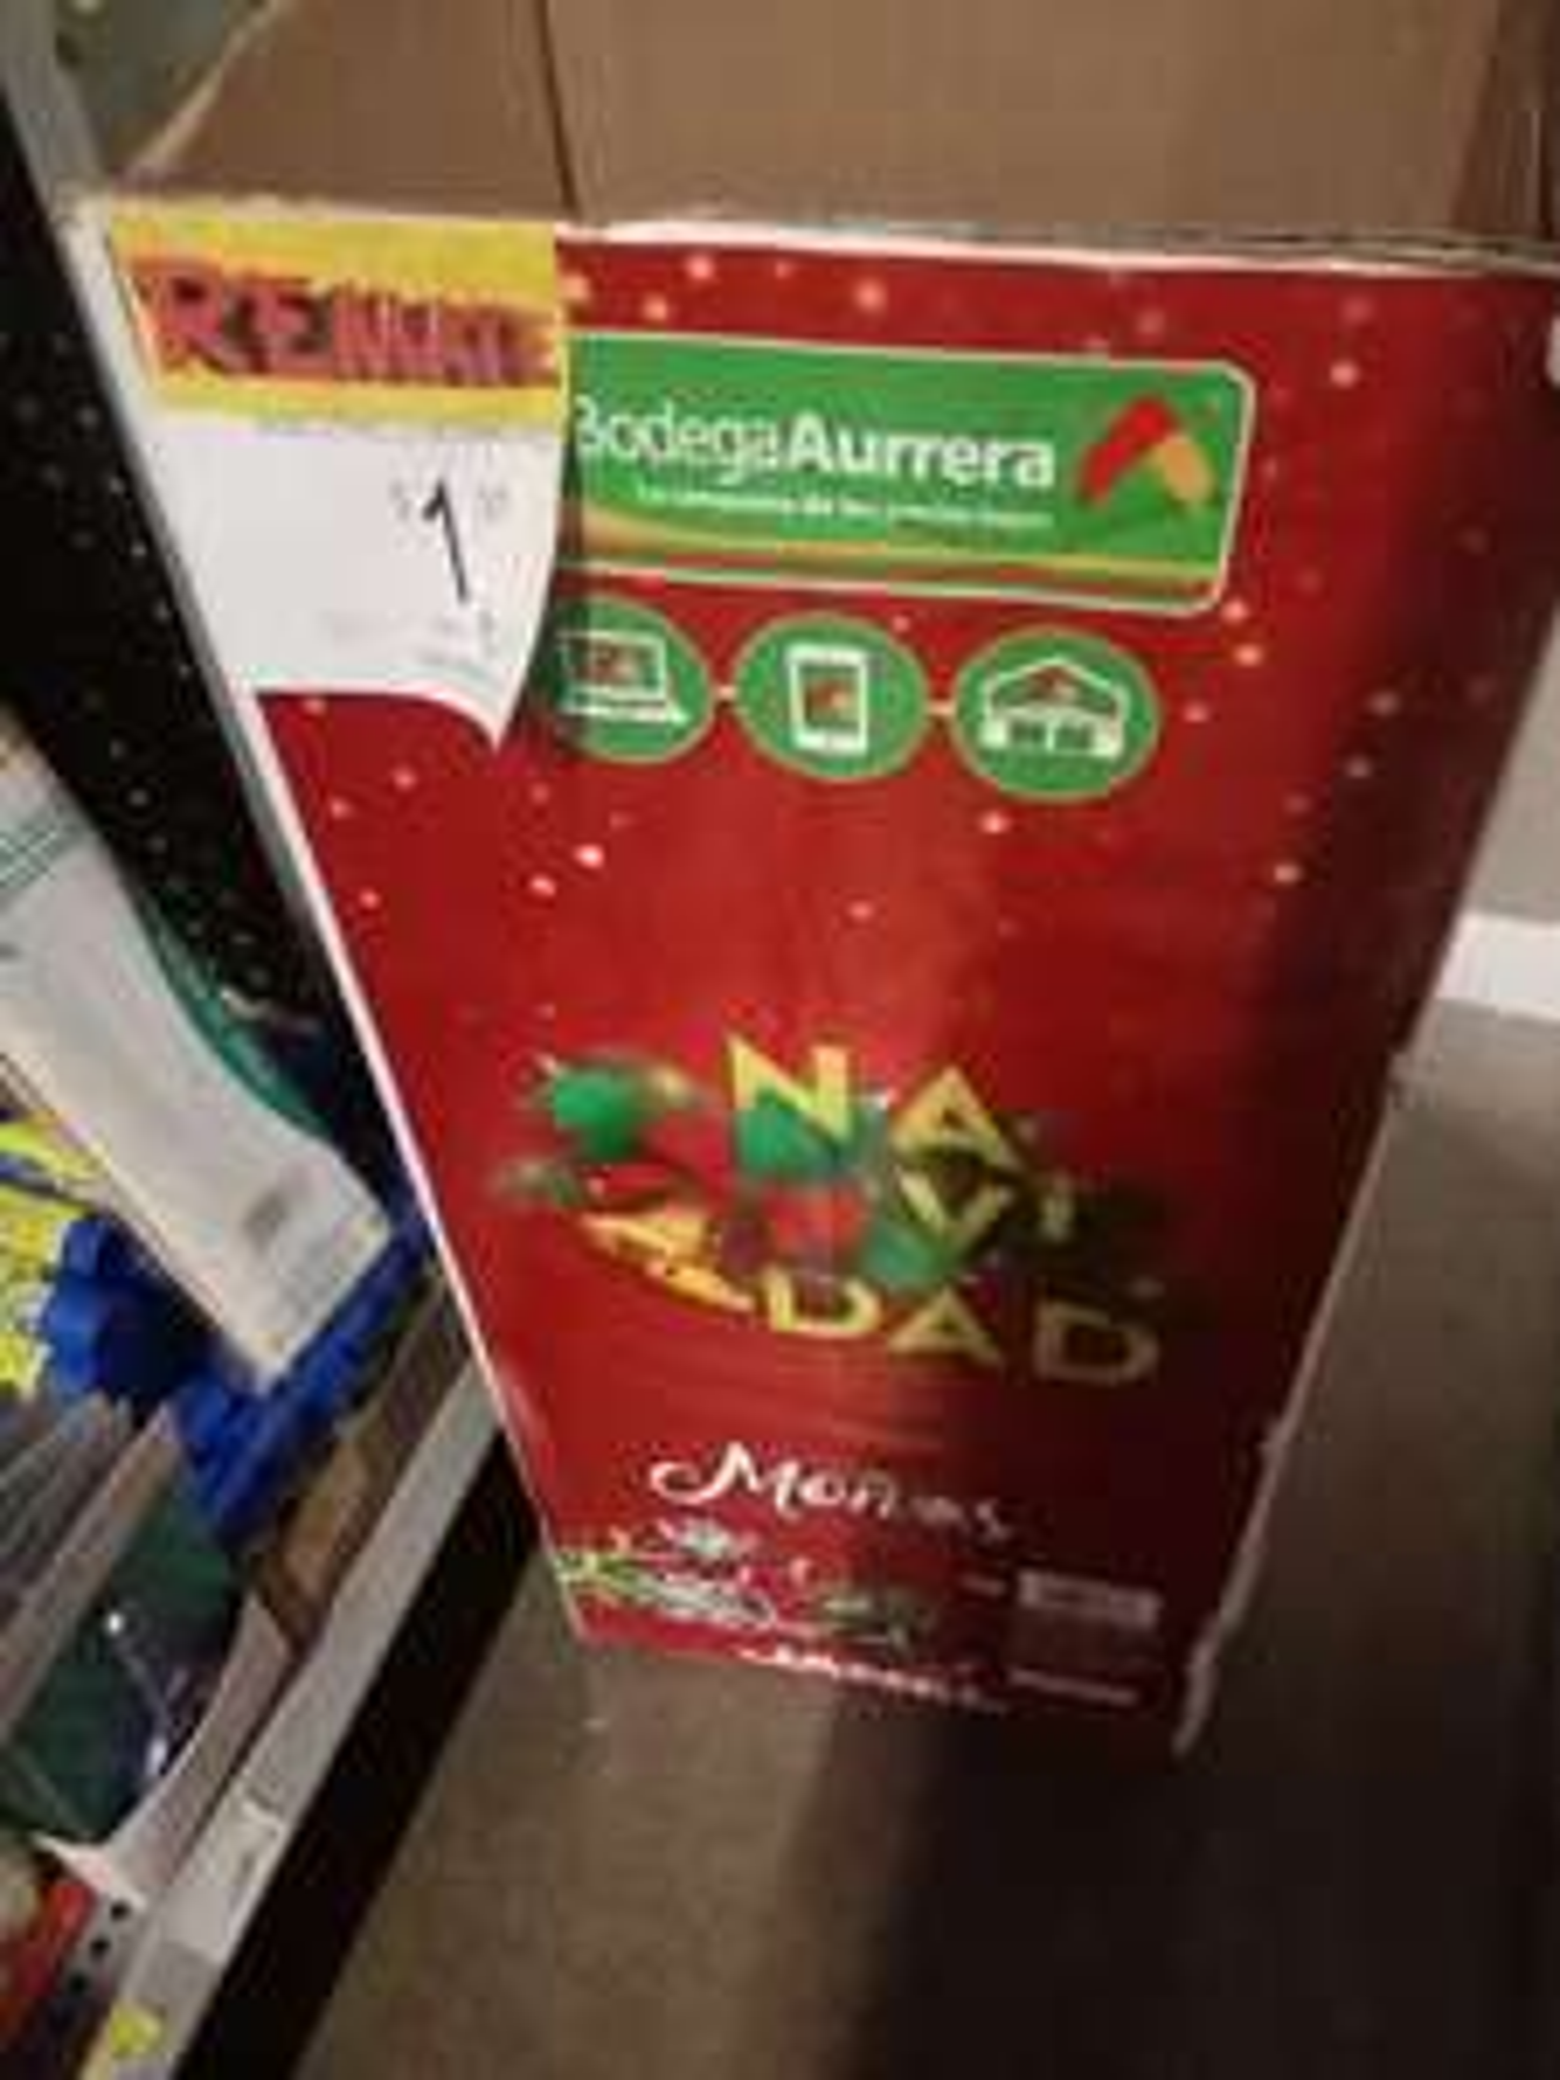 Bodega Aurrera: Moños de regalo a $1